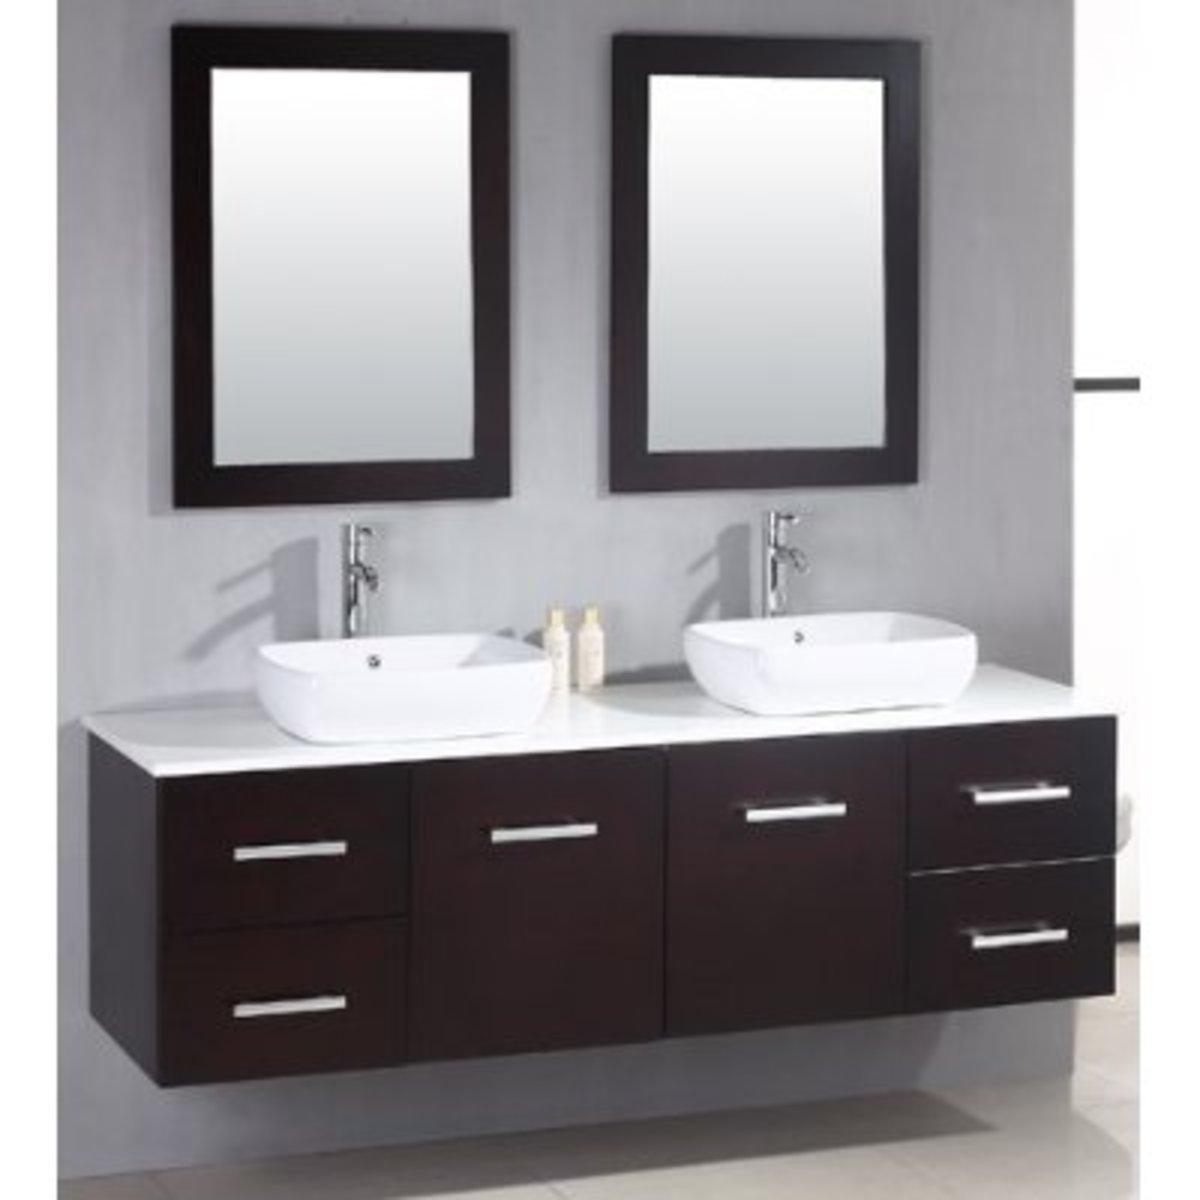 Modern or contemporary double bathroom sinks